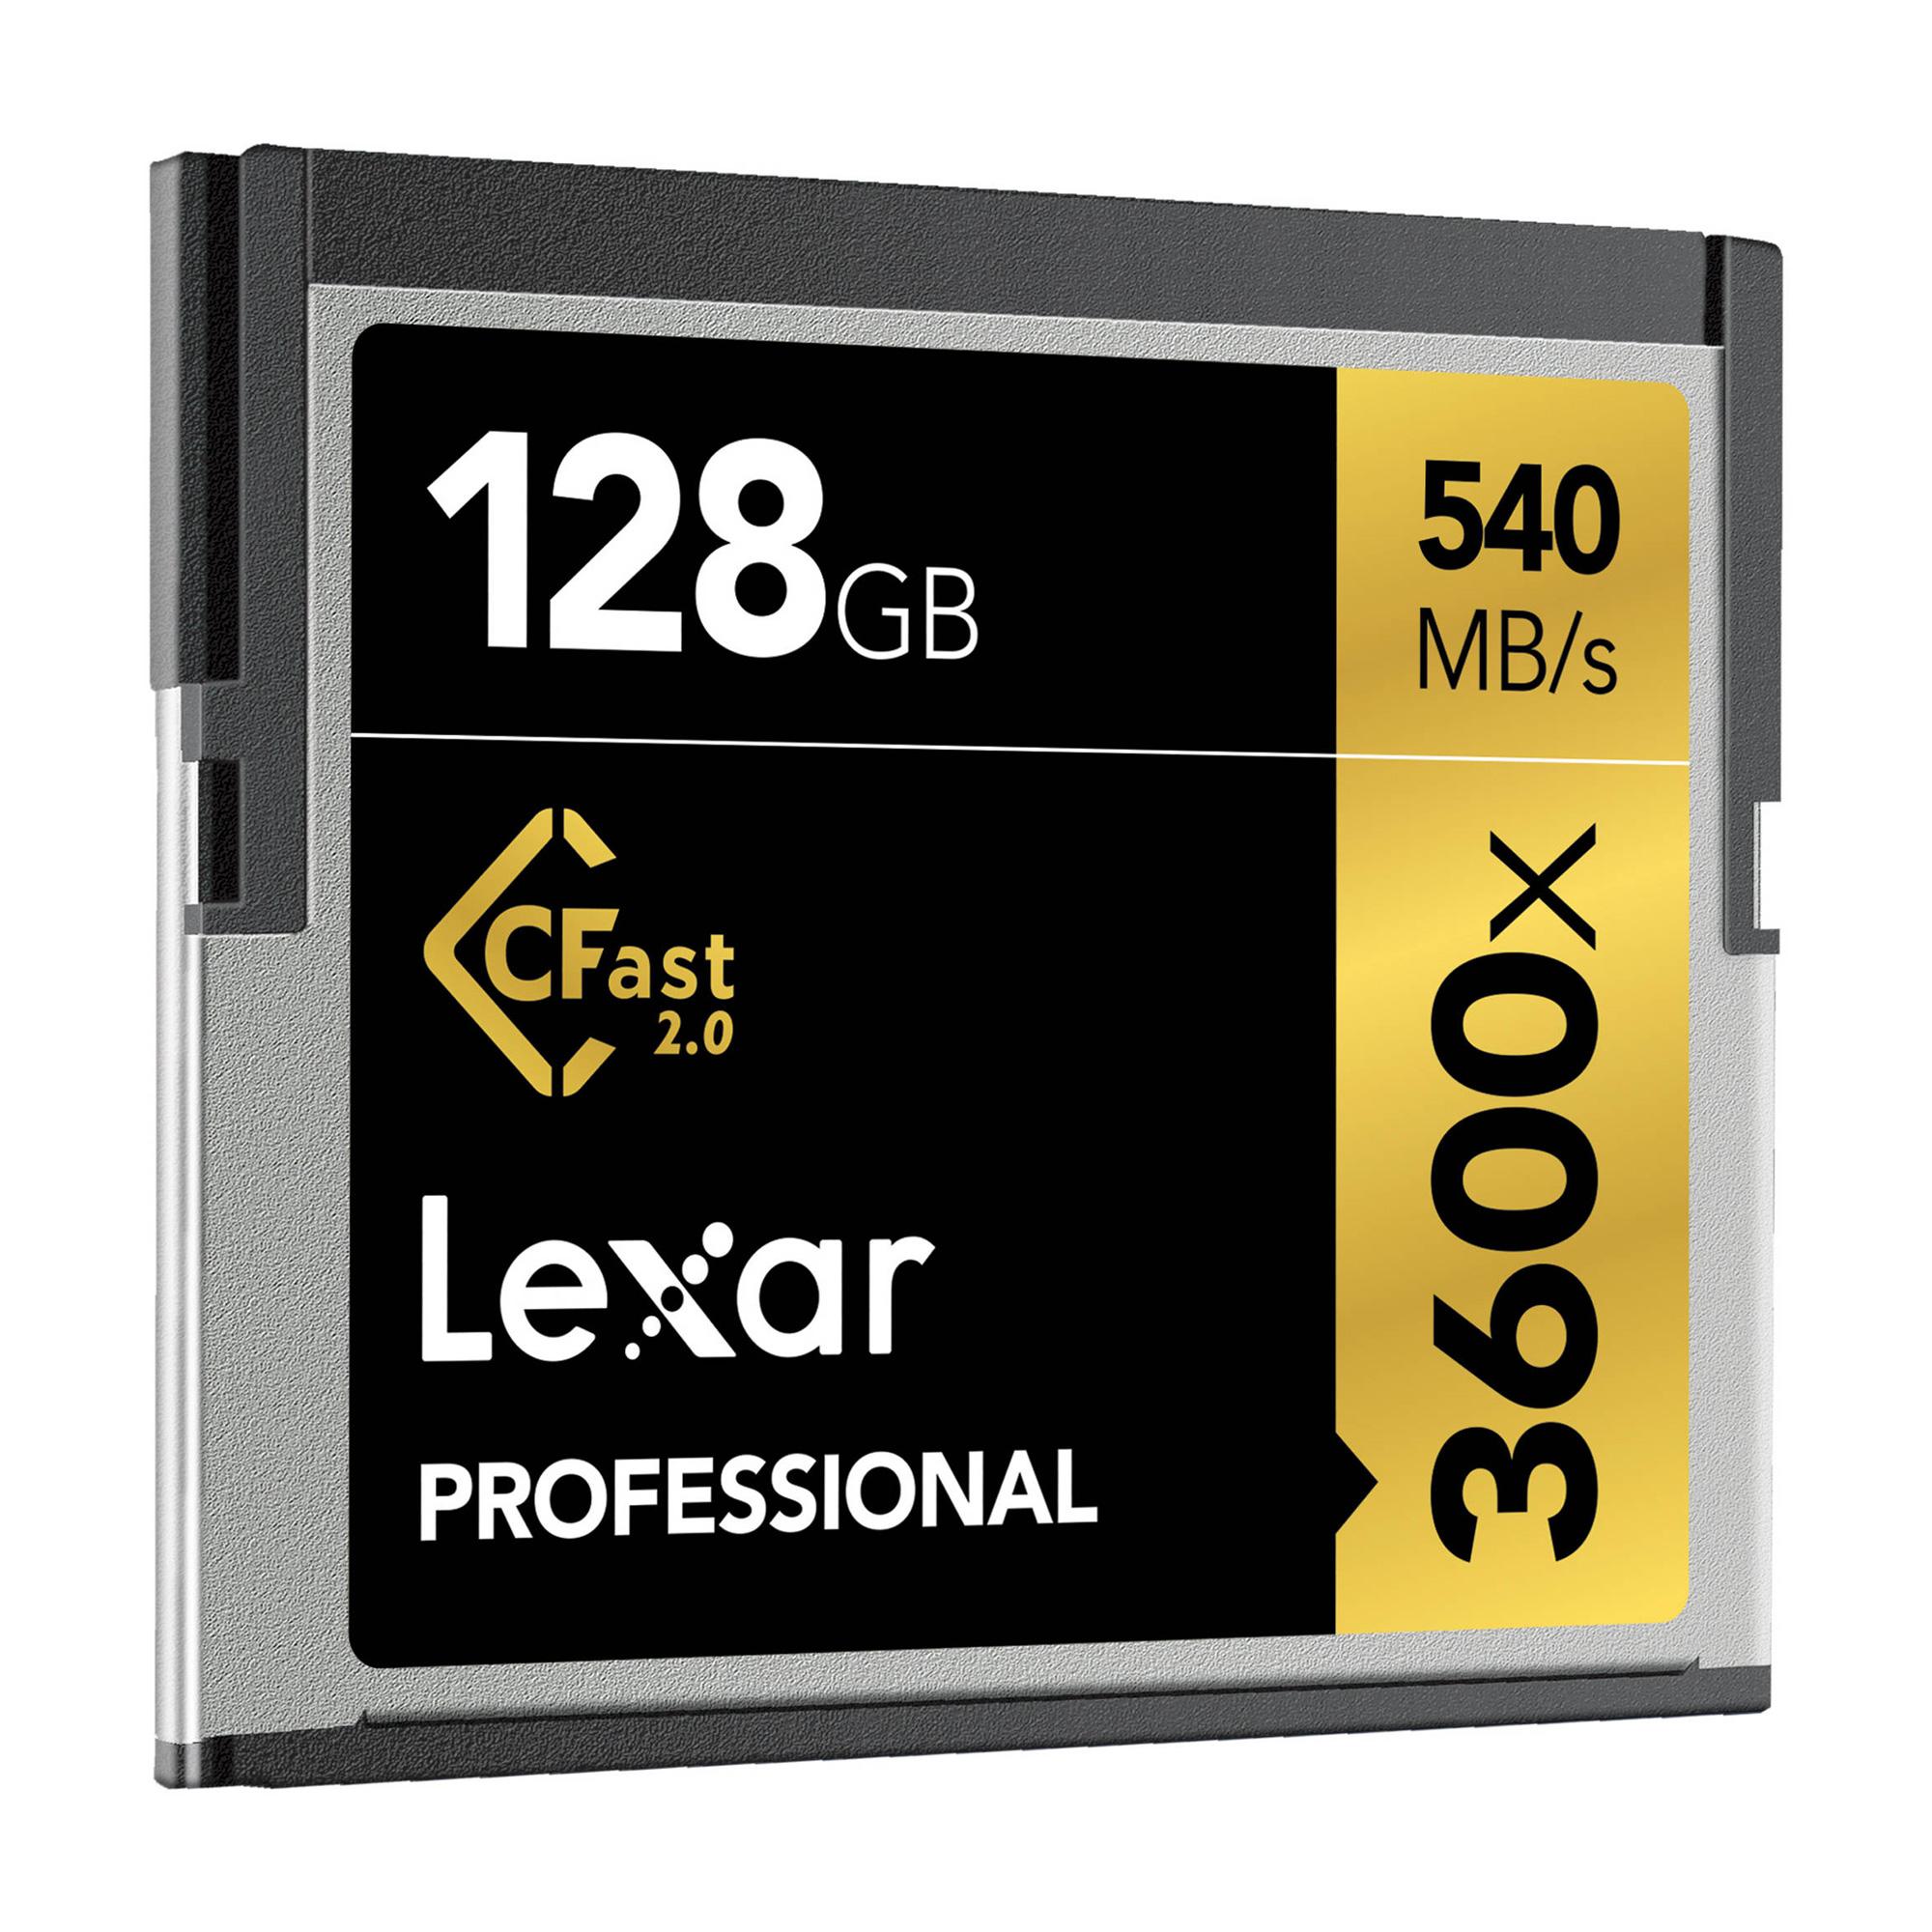 128GB Professional 3600x CFast 2.0 Memory Card